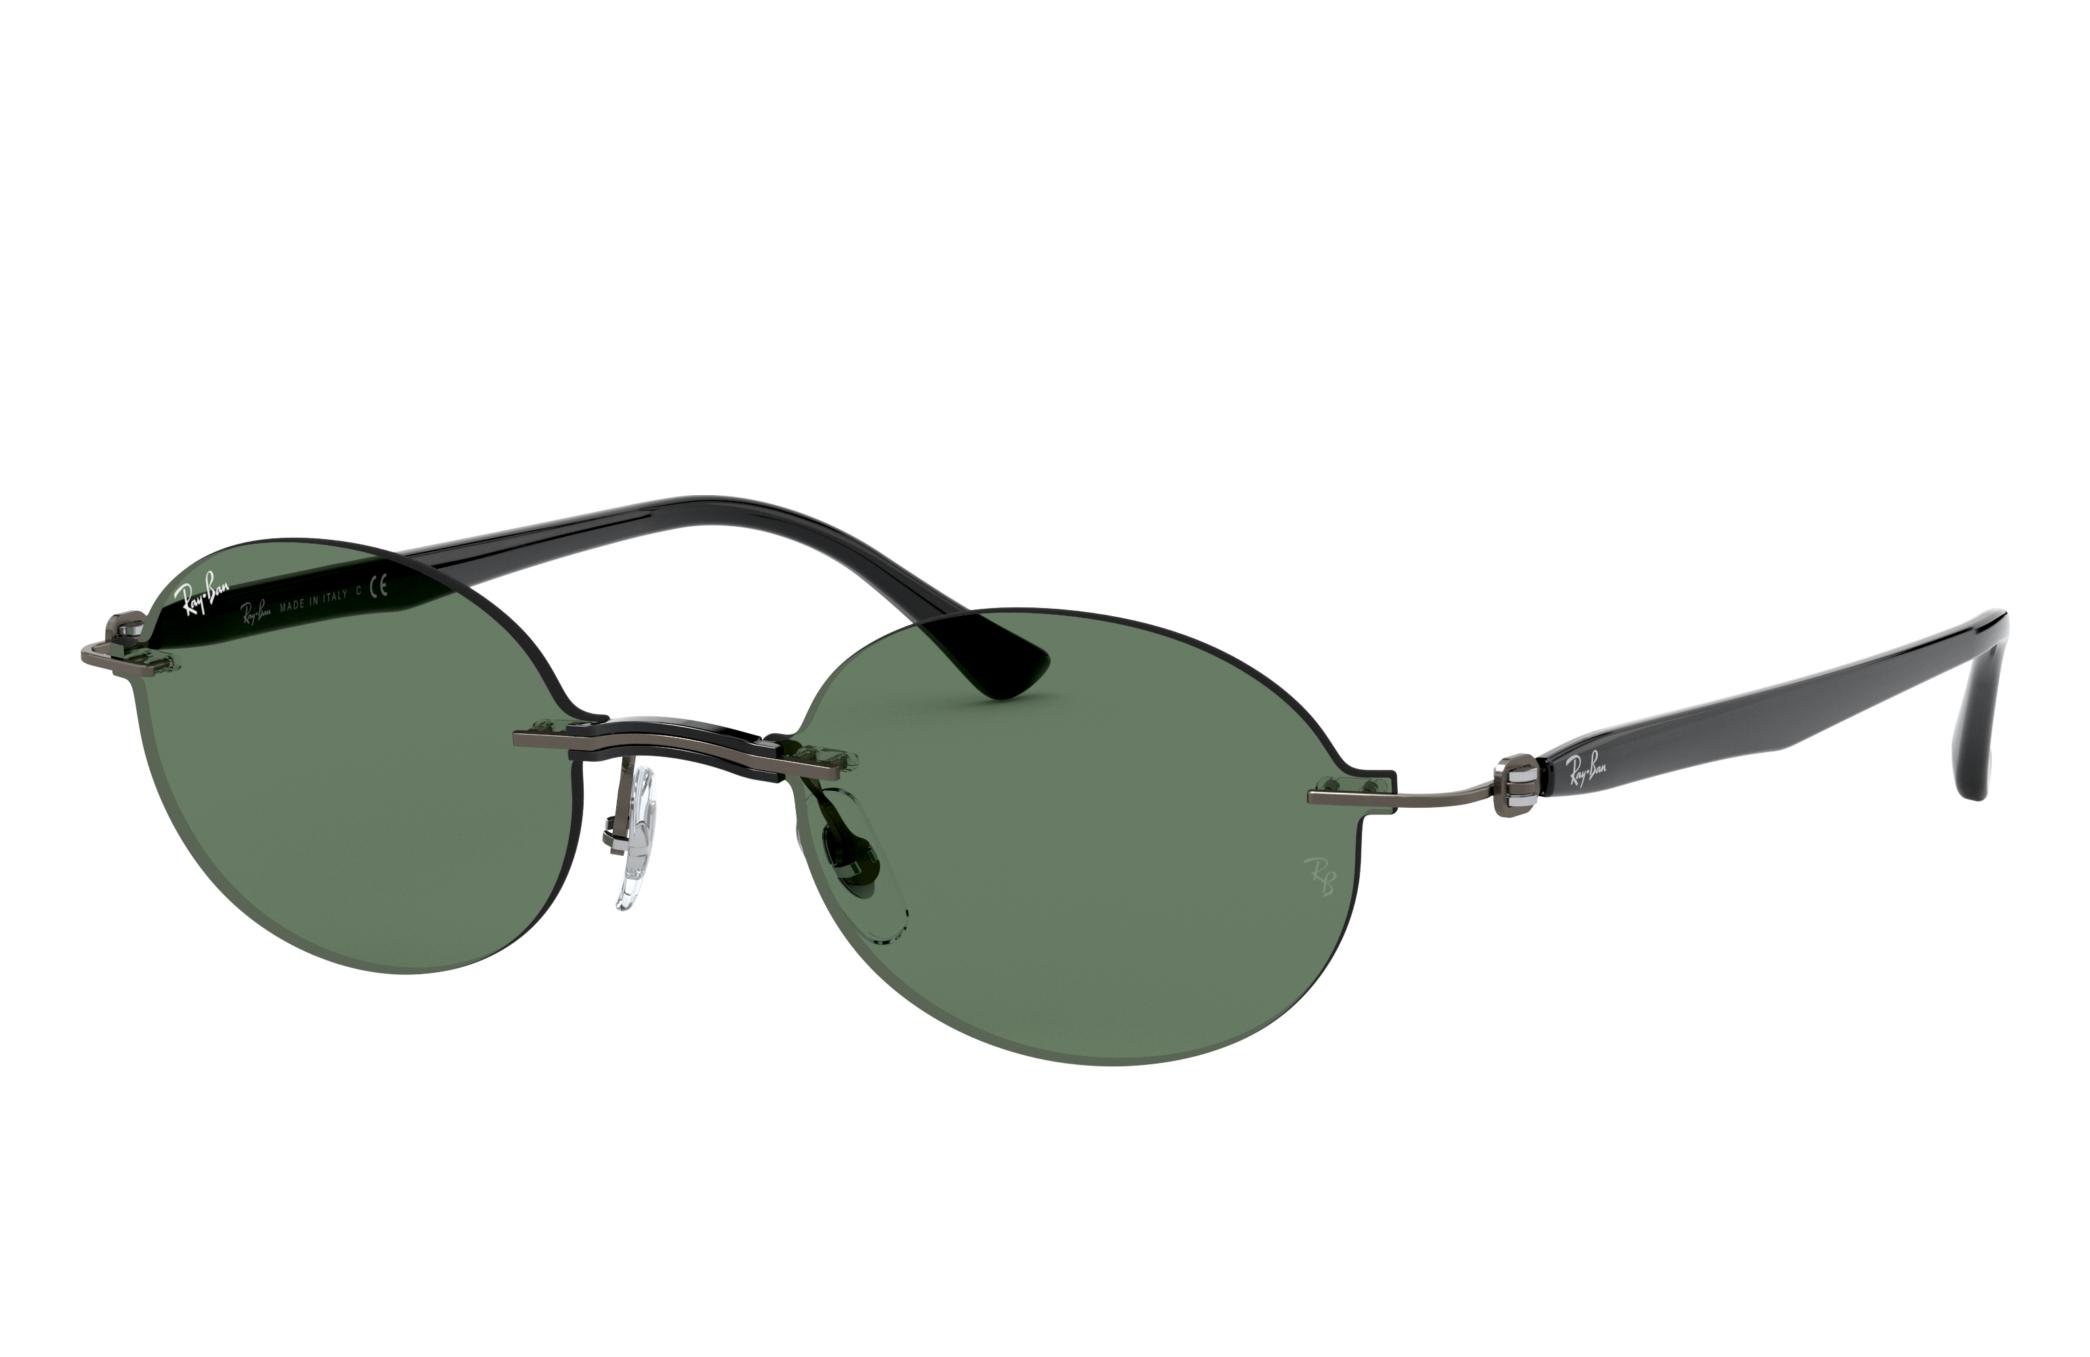 Ray-Ban Rb8060 Gunmetal, Green Lenses - RB8060